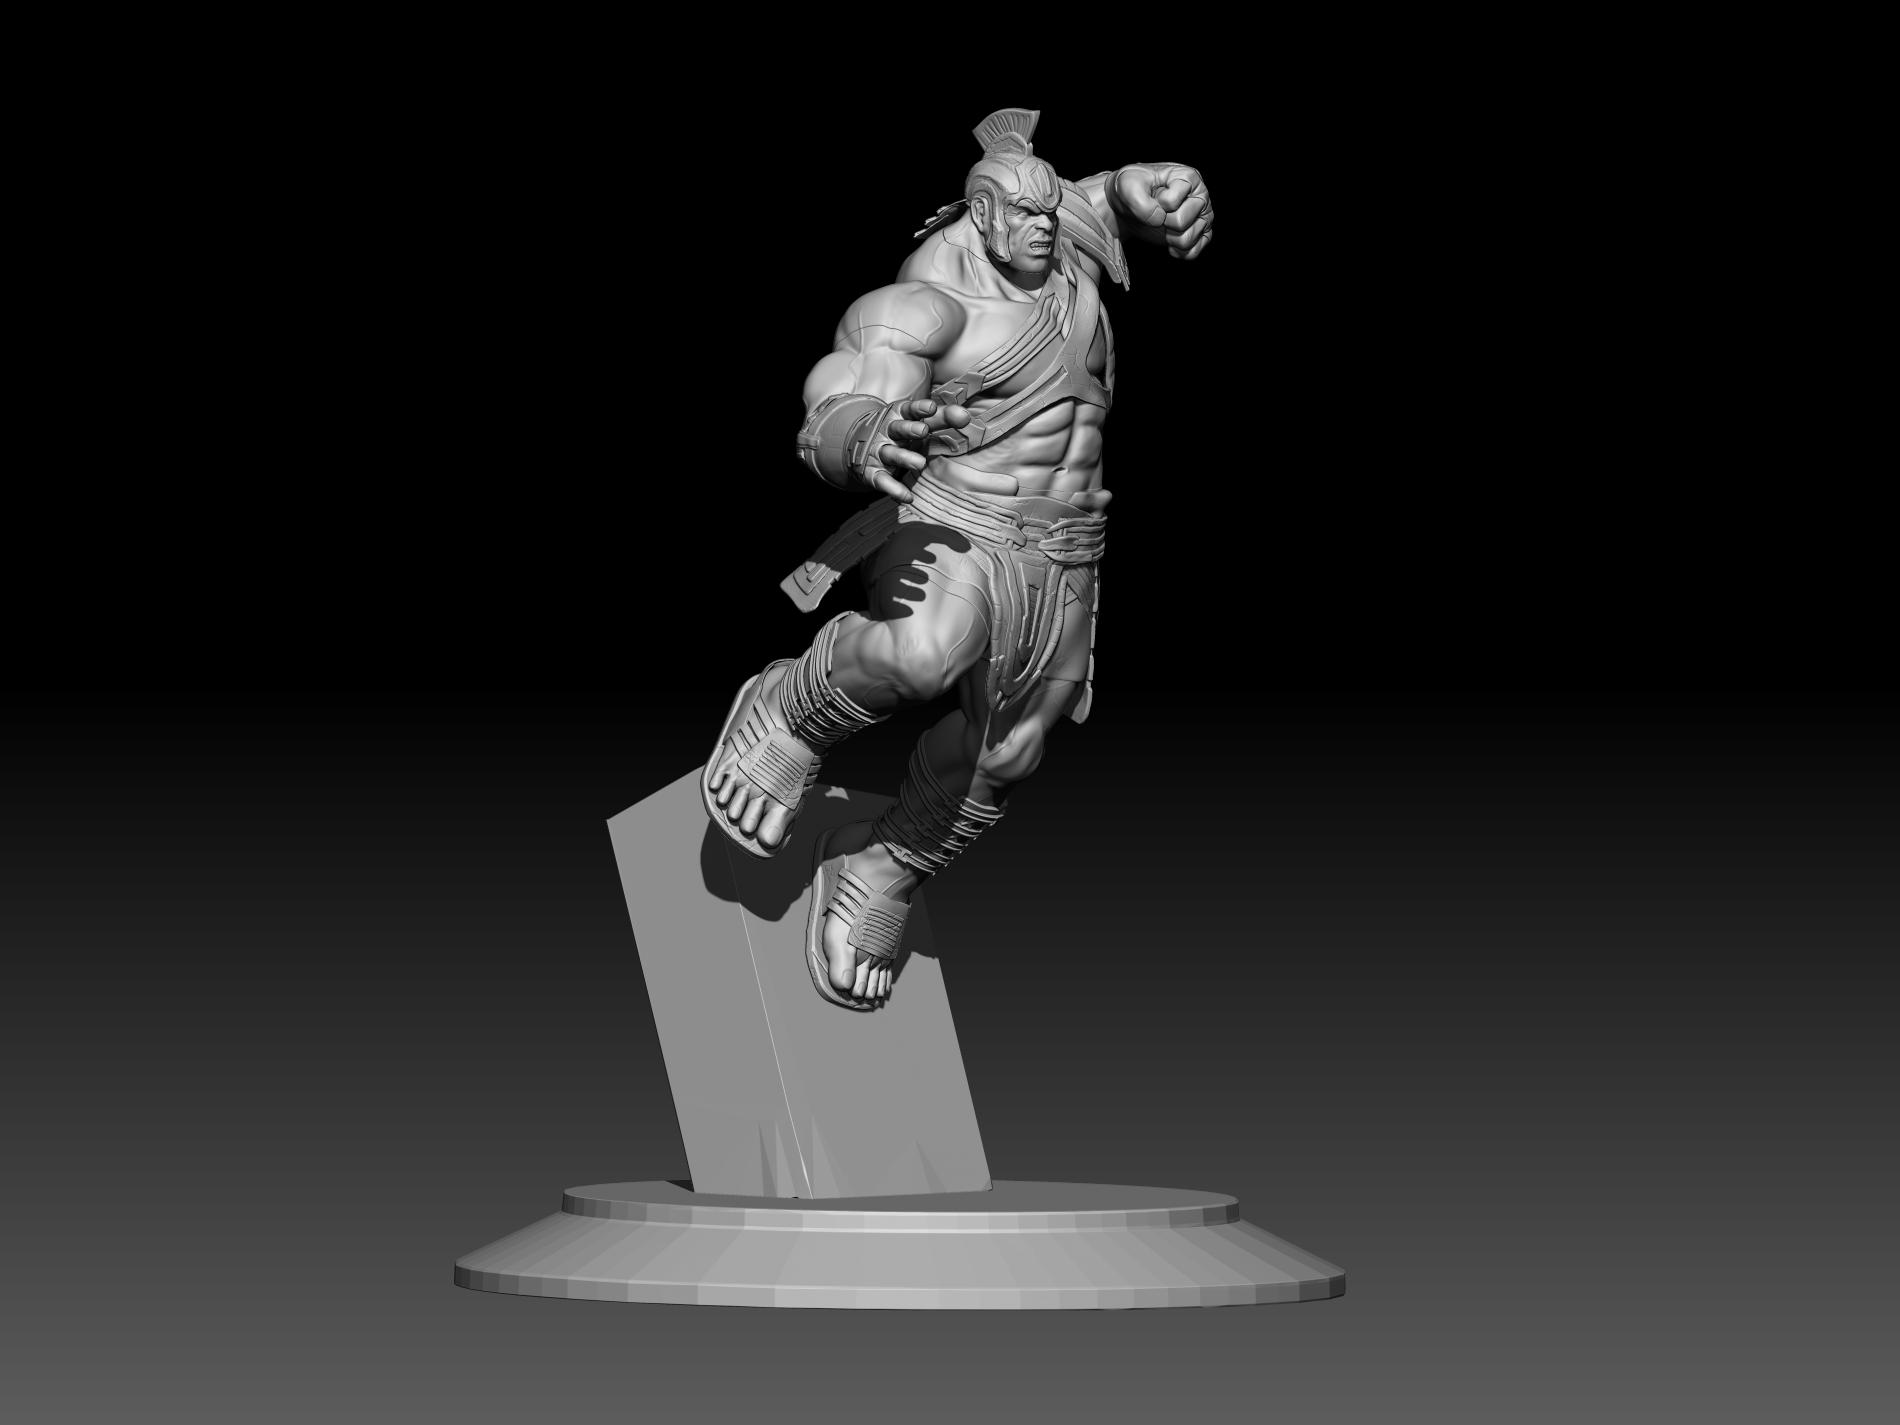 9.jpg Download STL file Hulk 3D print • Model to 3D print, mark_nato